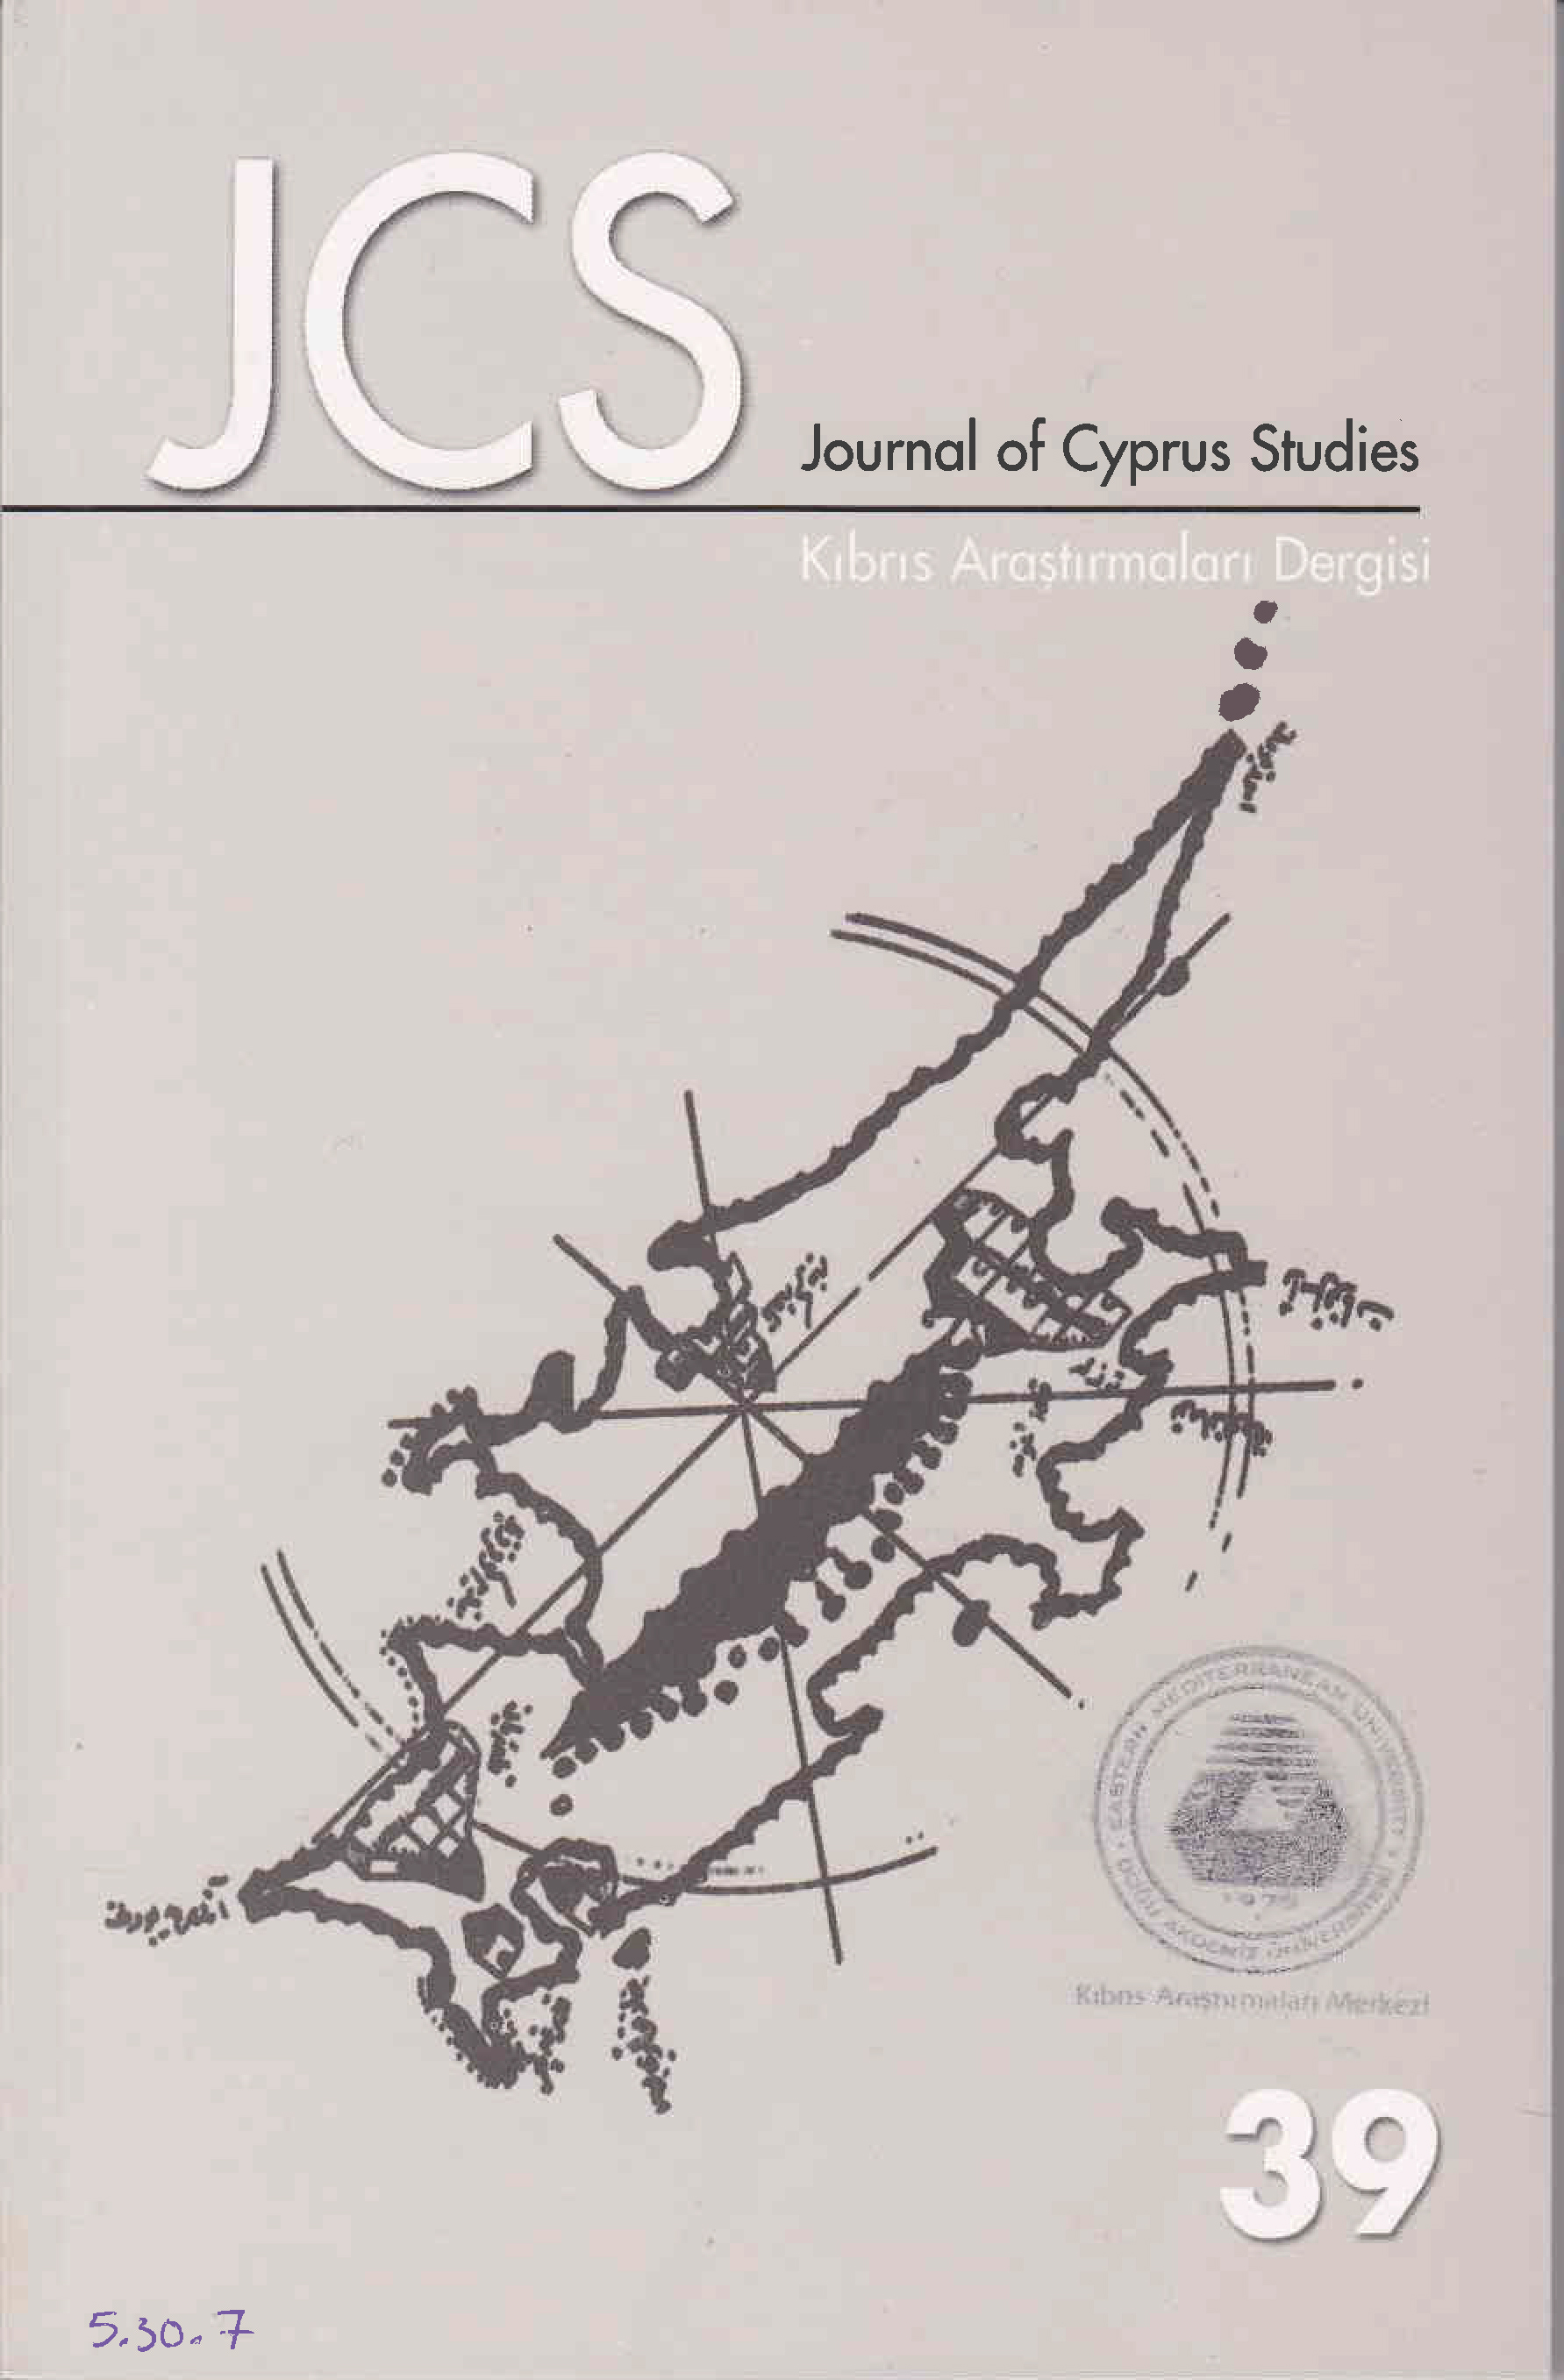 View Vol. 16 No. 39 (2010): Journal of Cyprus Studies